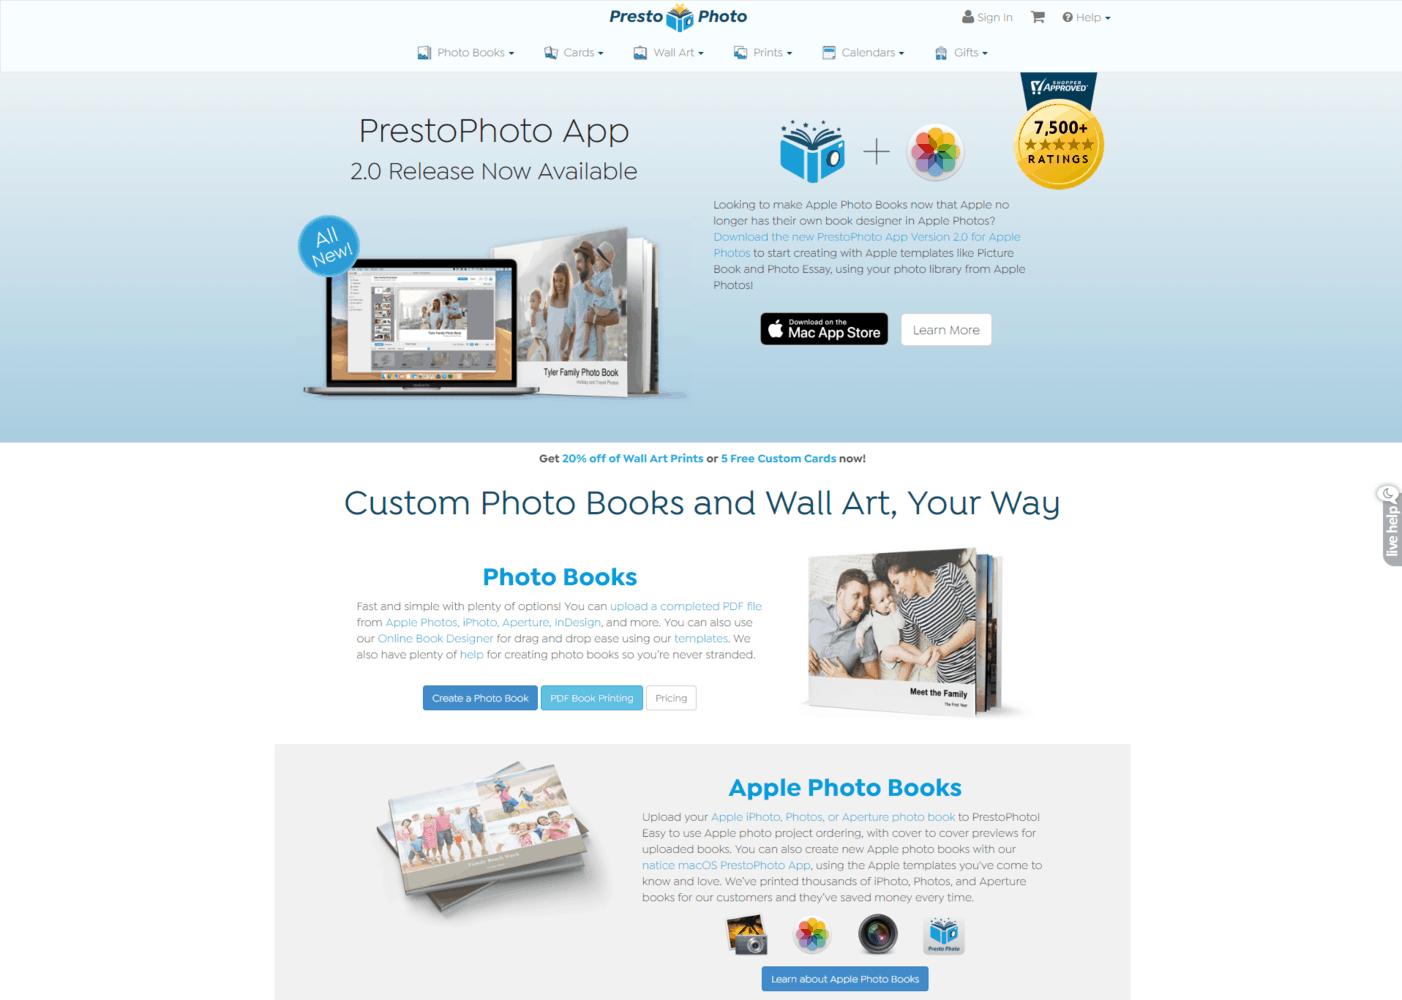 Portfolio imprimé en ligne - - Presto Shop